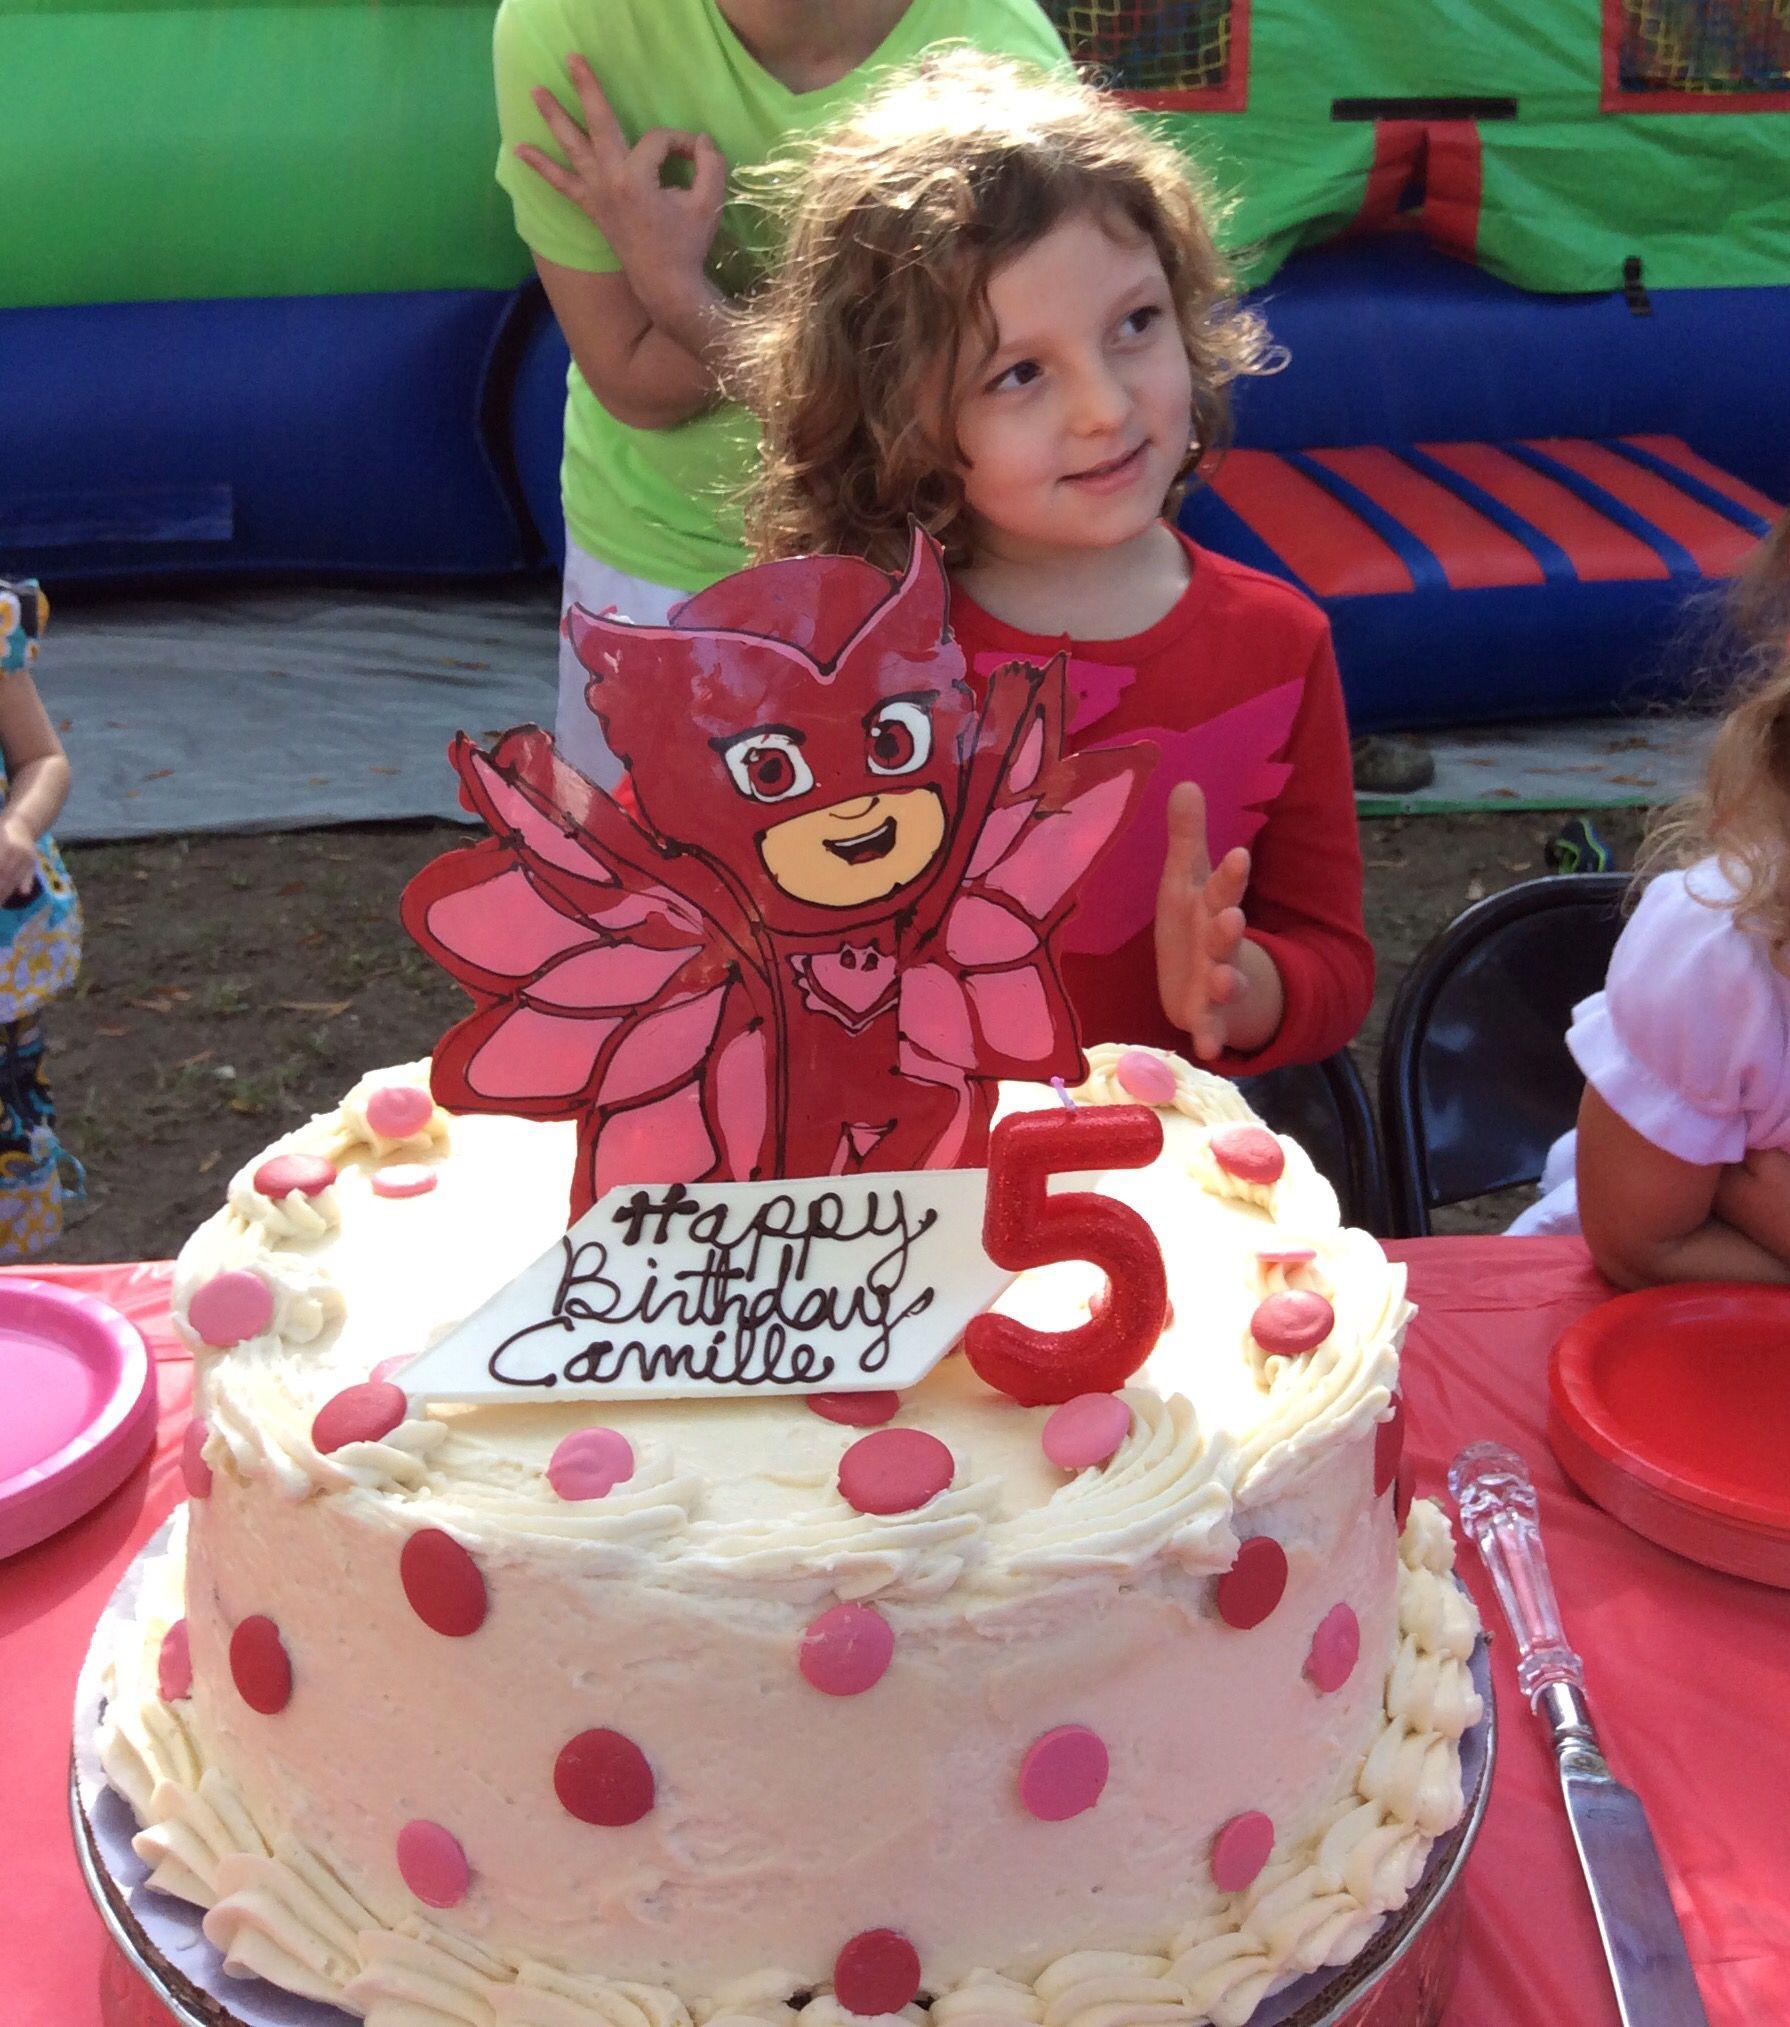 Owlette Pj Mask Pj Masks Birthday Cake Birthday Cake